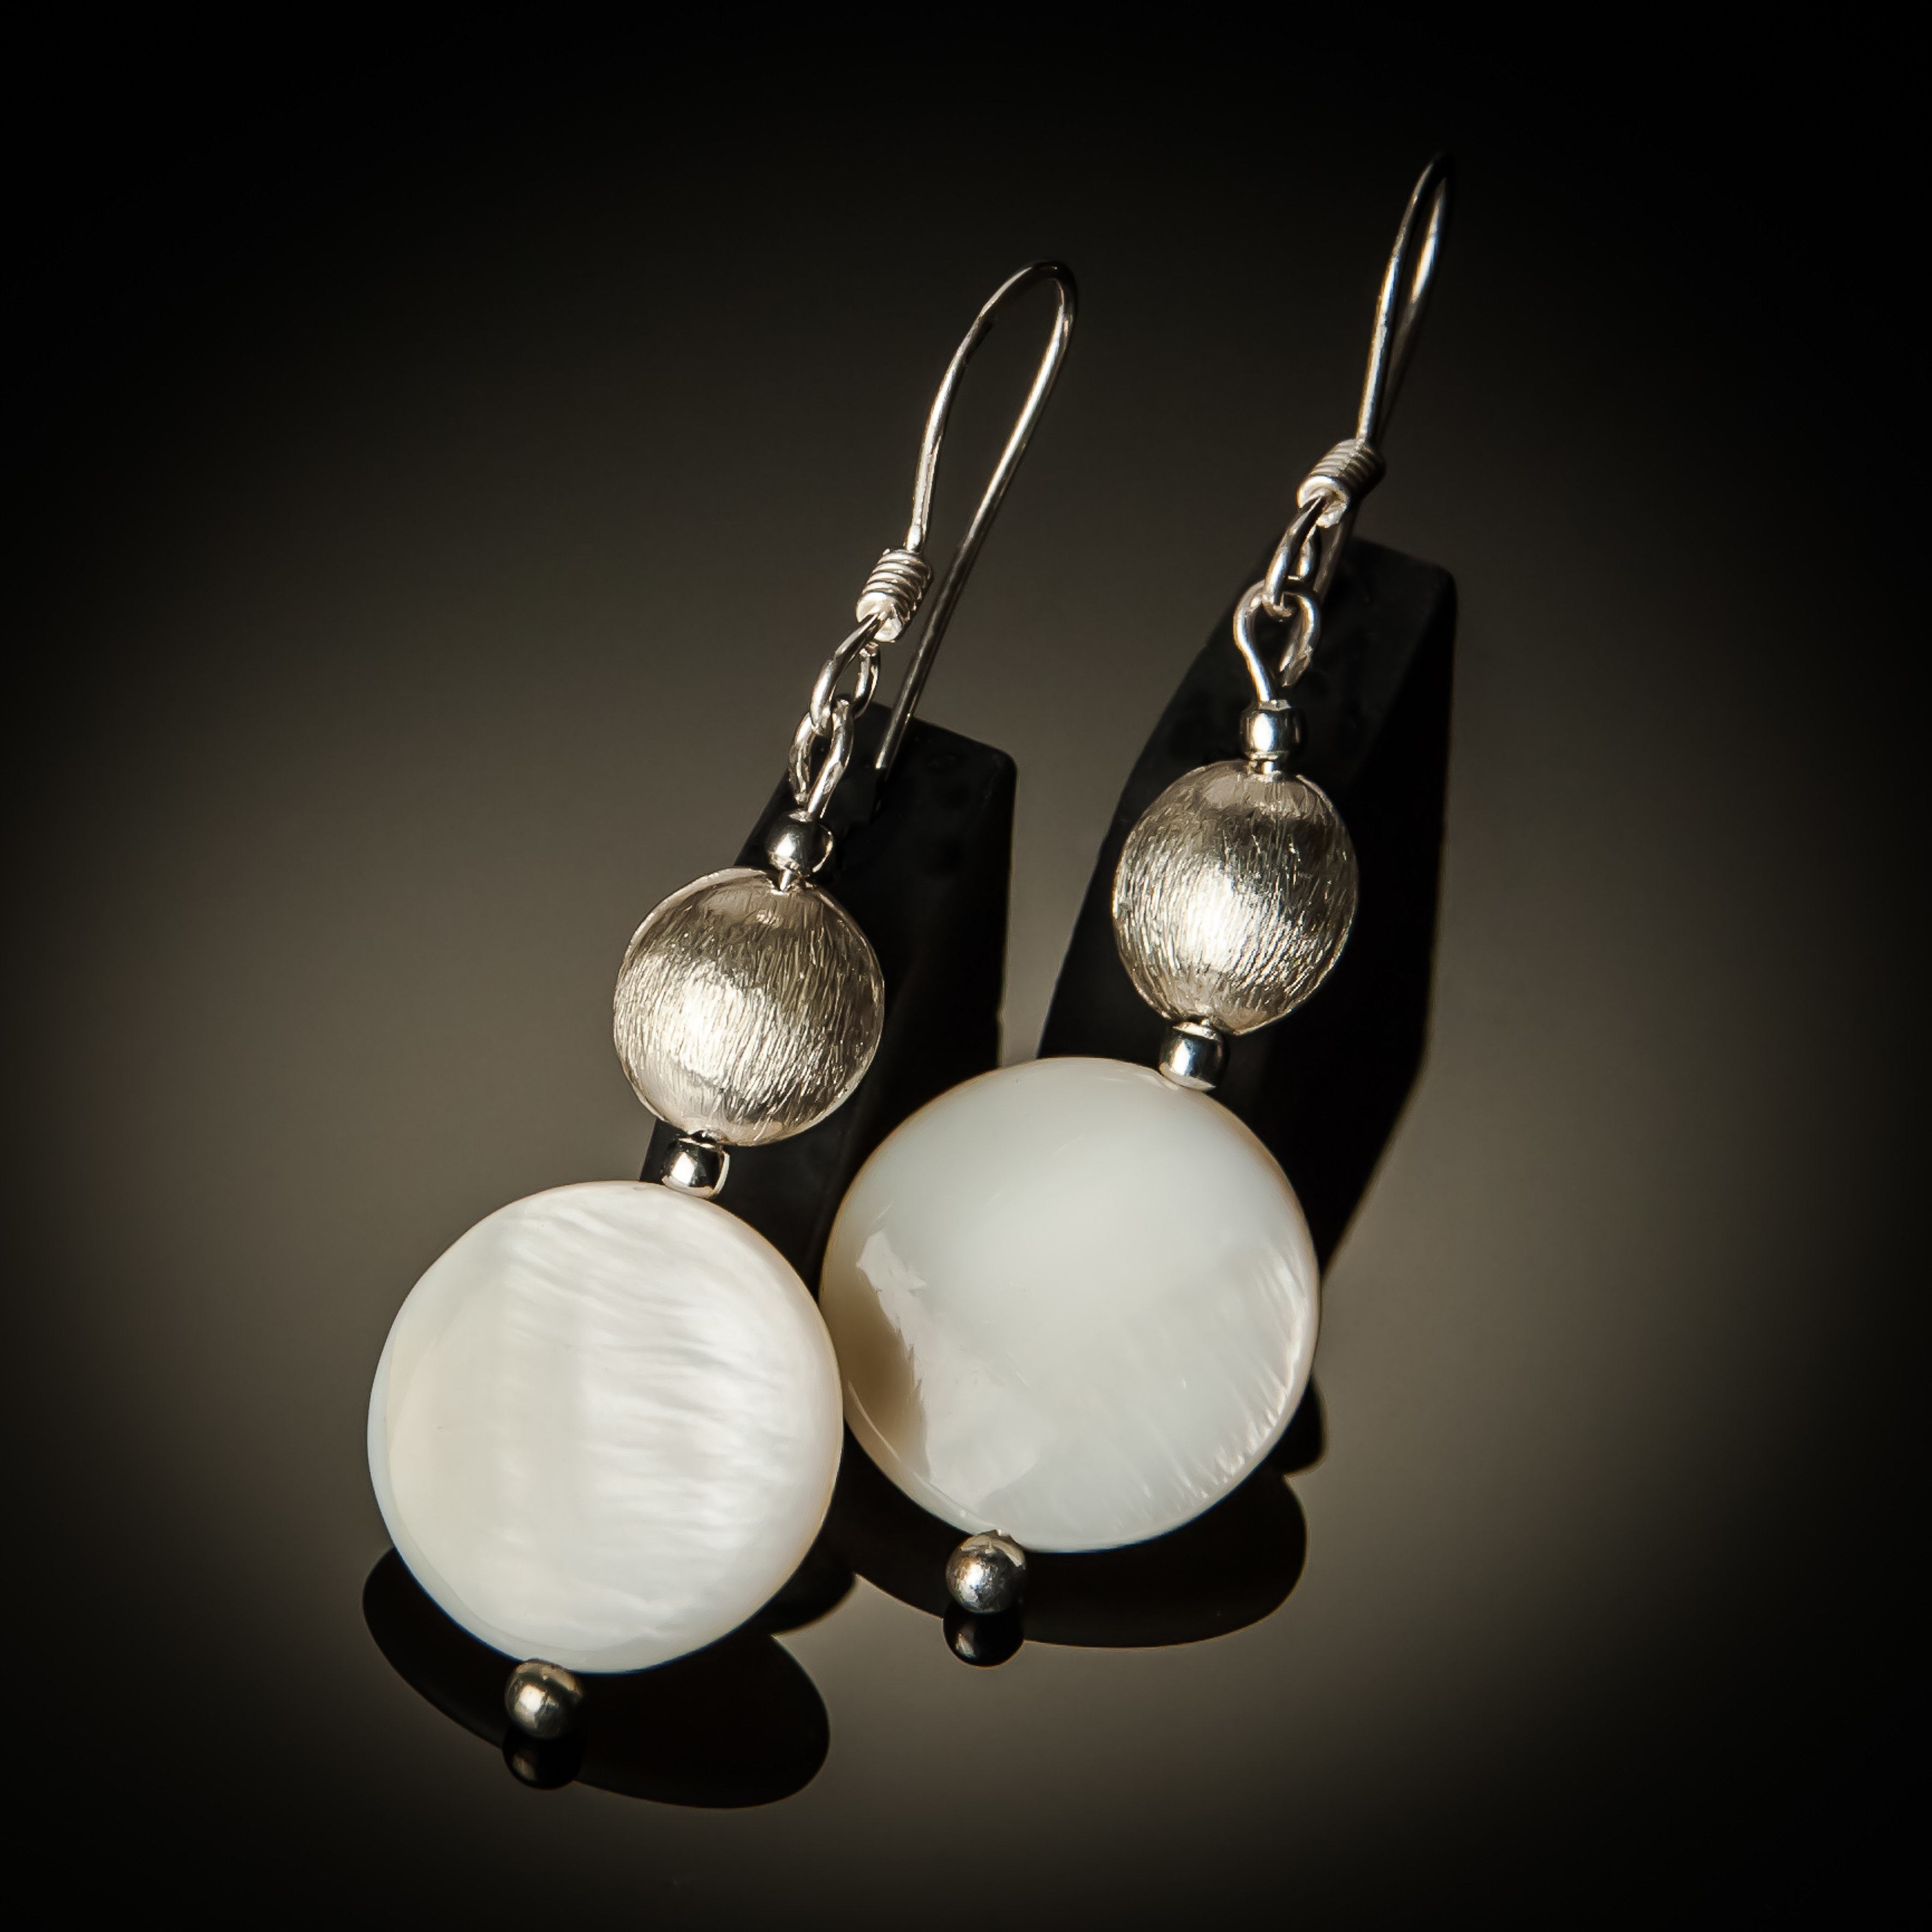 Mother of Pearl Sterling Silver Earrings 658-B-ER-Mop